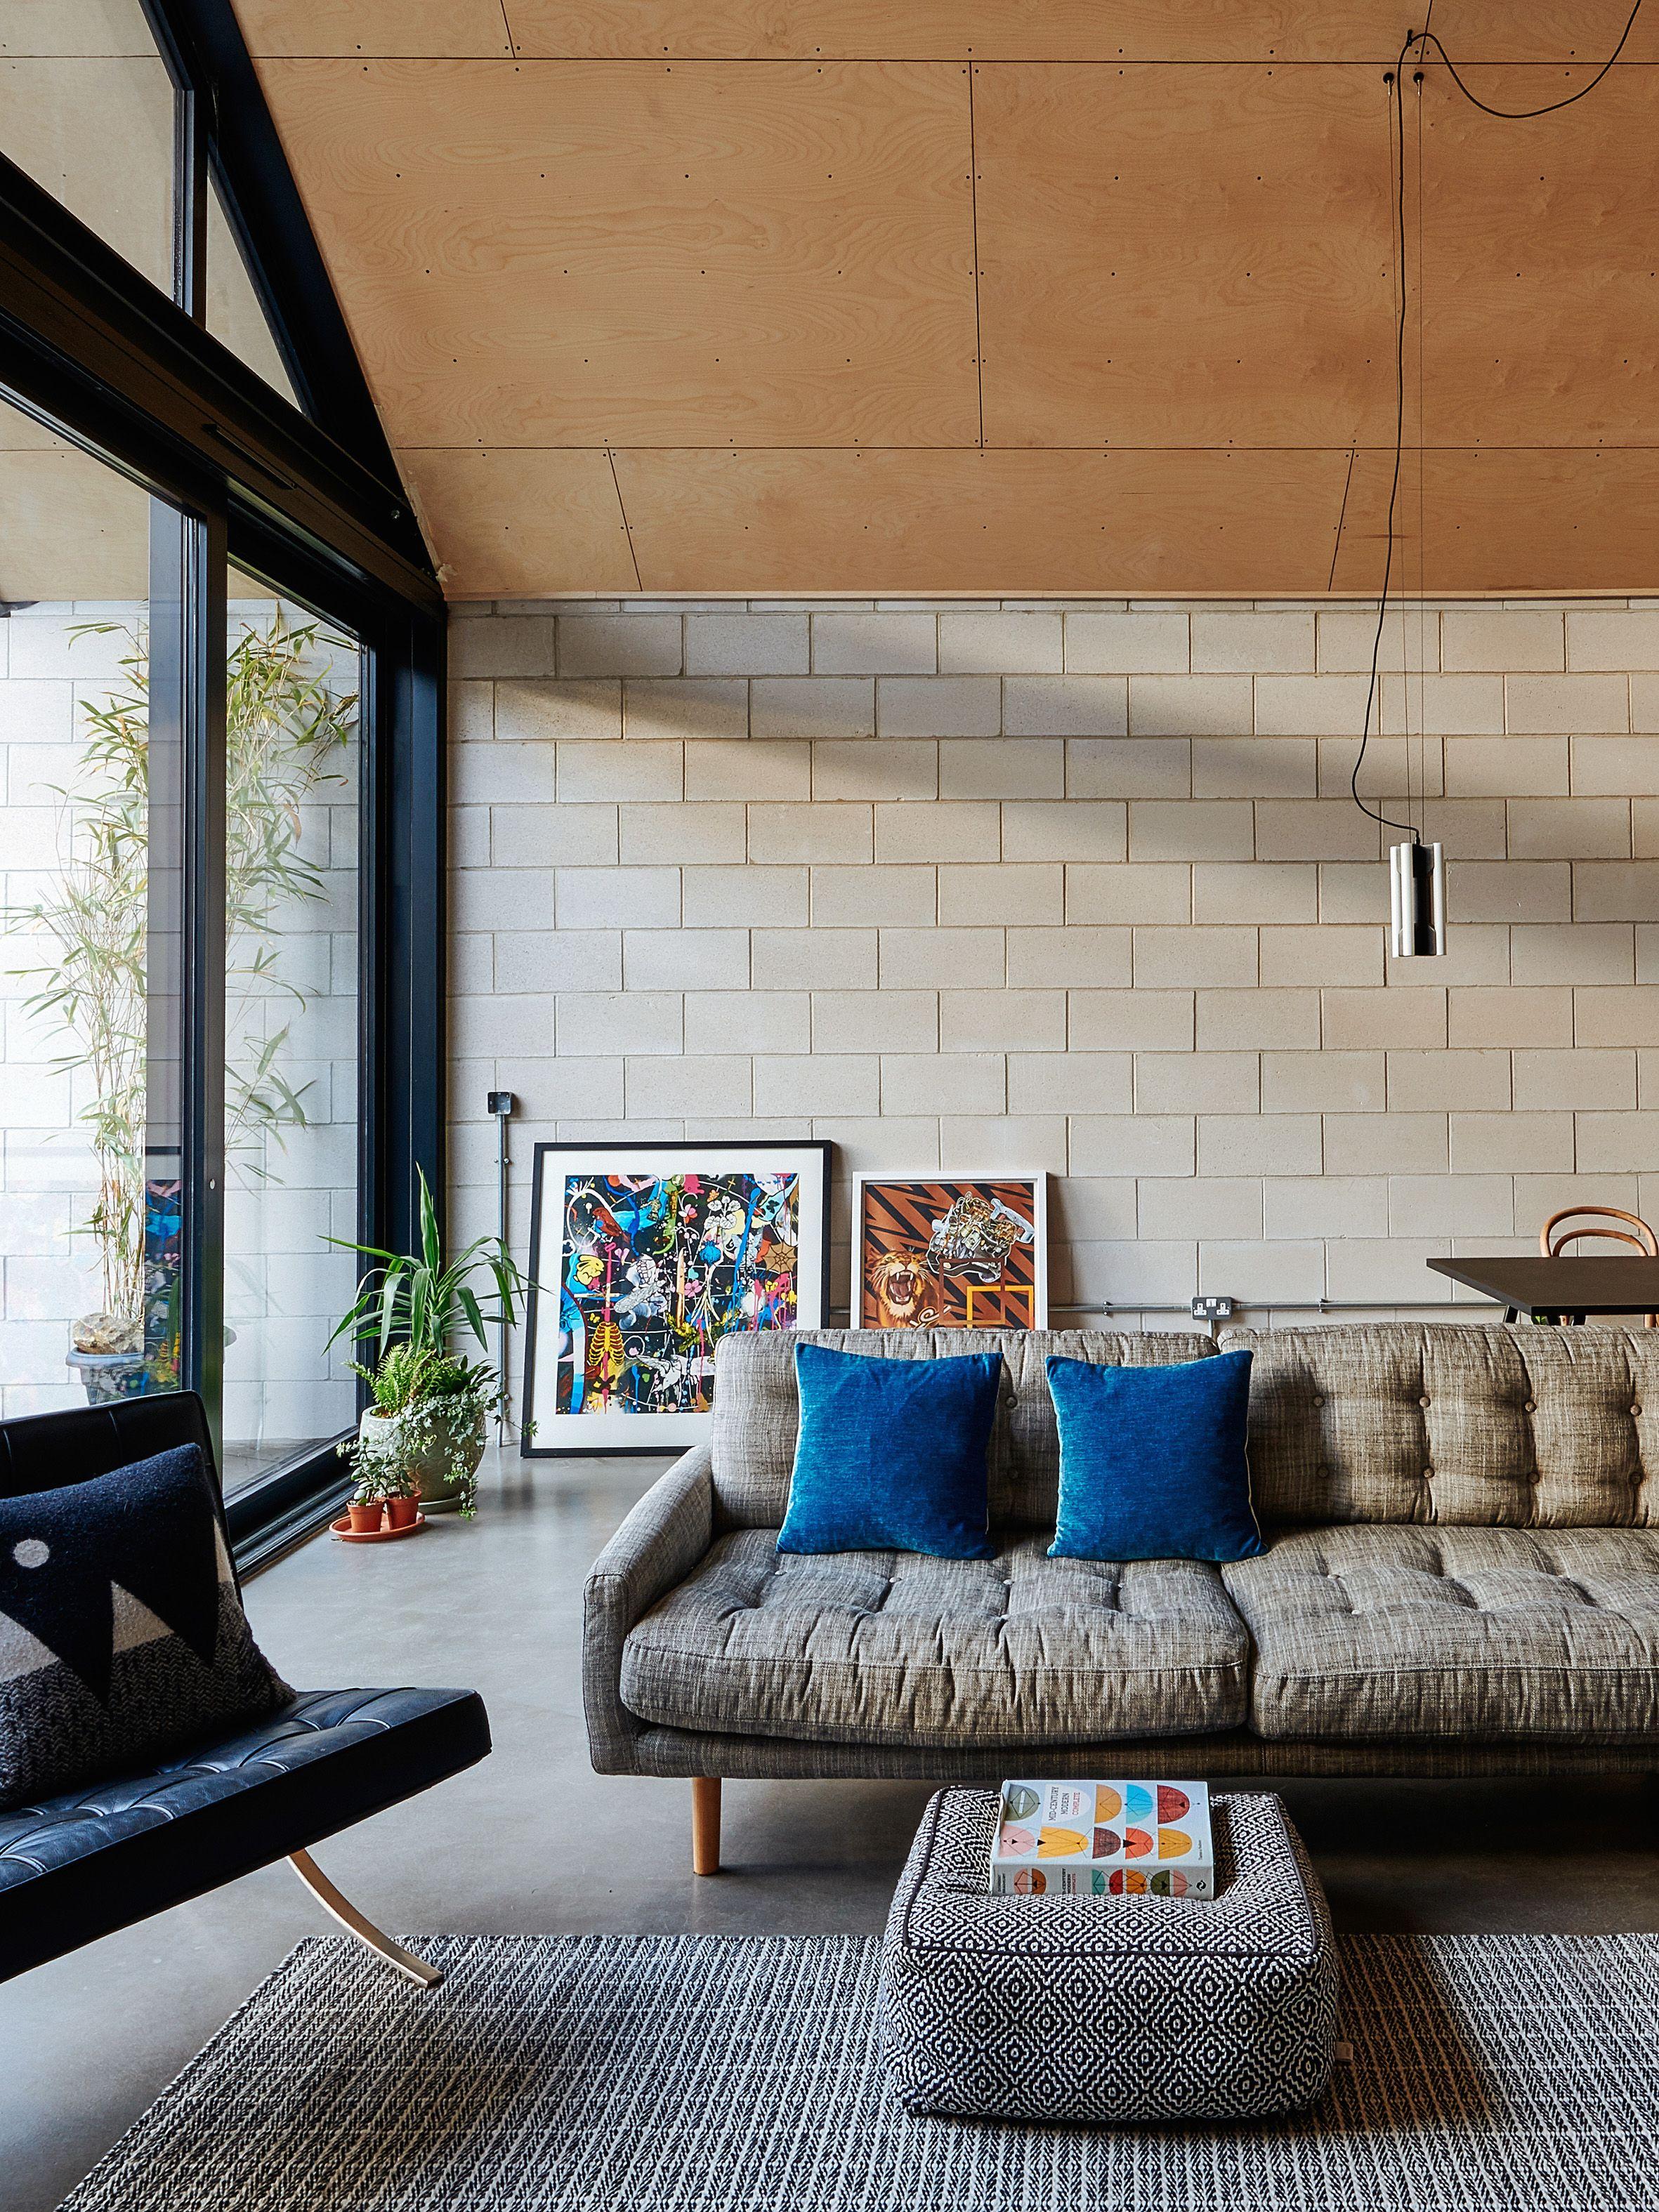 Avis Maison Habitat Concept original habitat: jon and nik daughtry   dark walls living